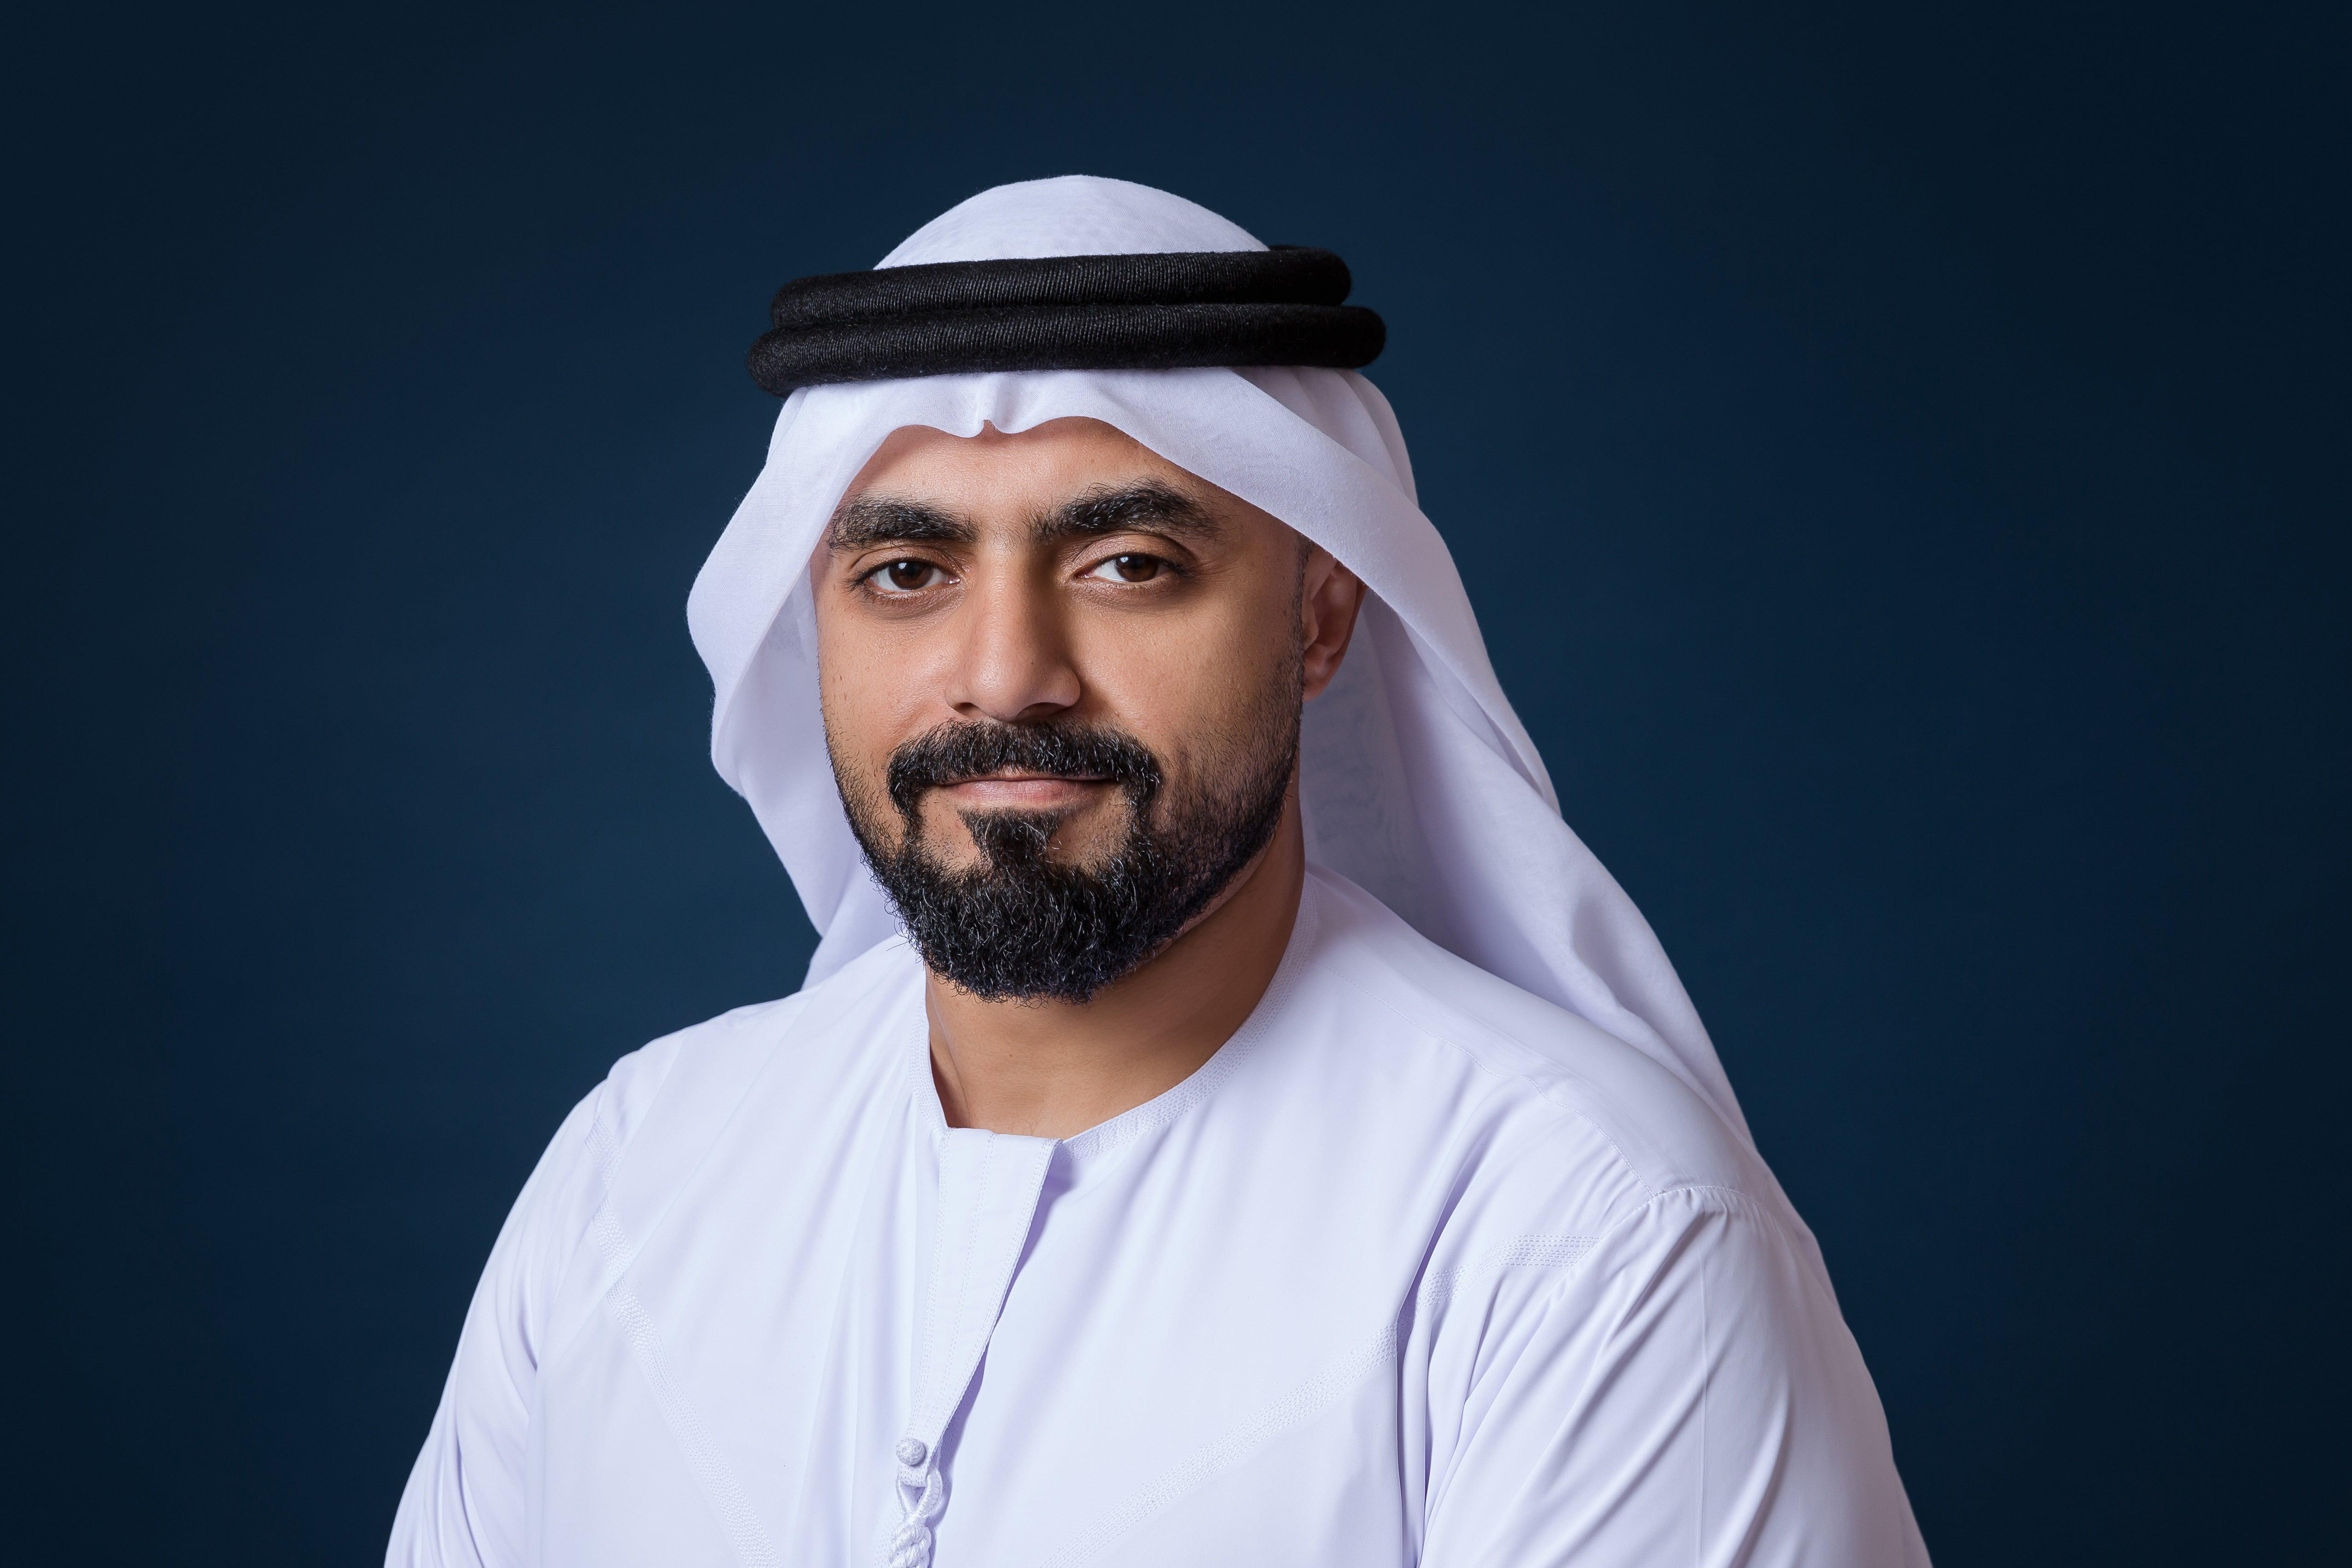 meet-taryam-al-subaihi-mepras-first-emirati-chairperson